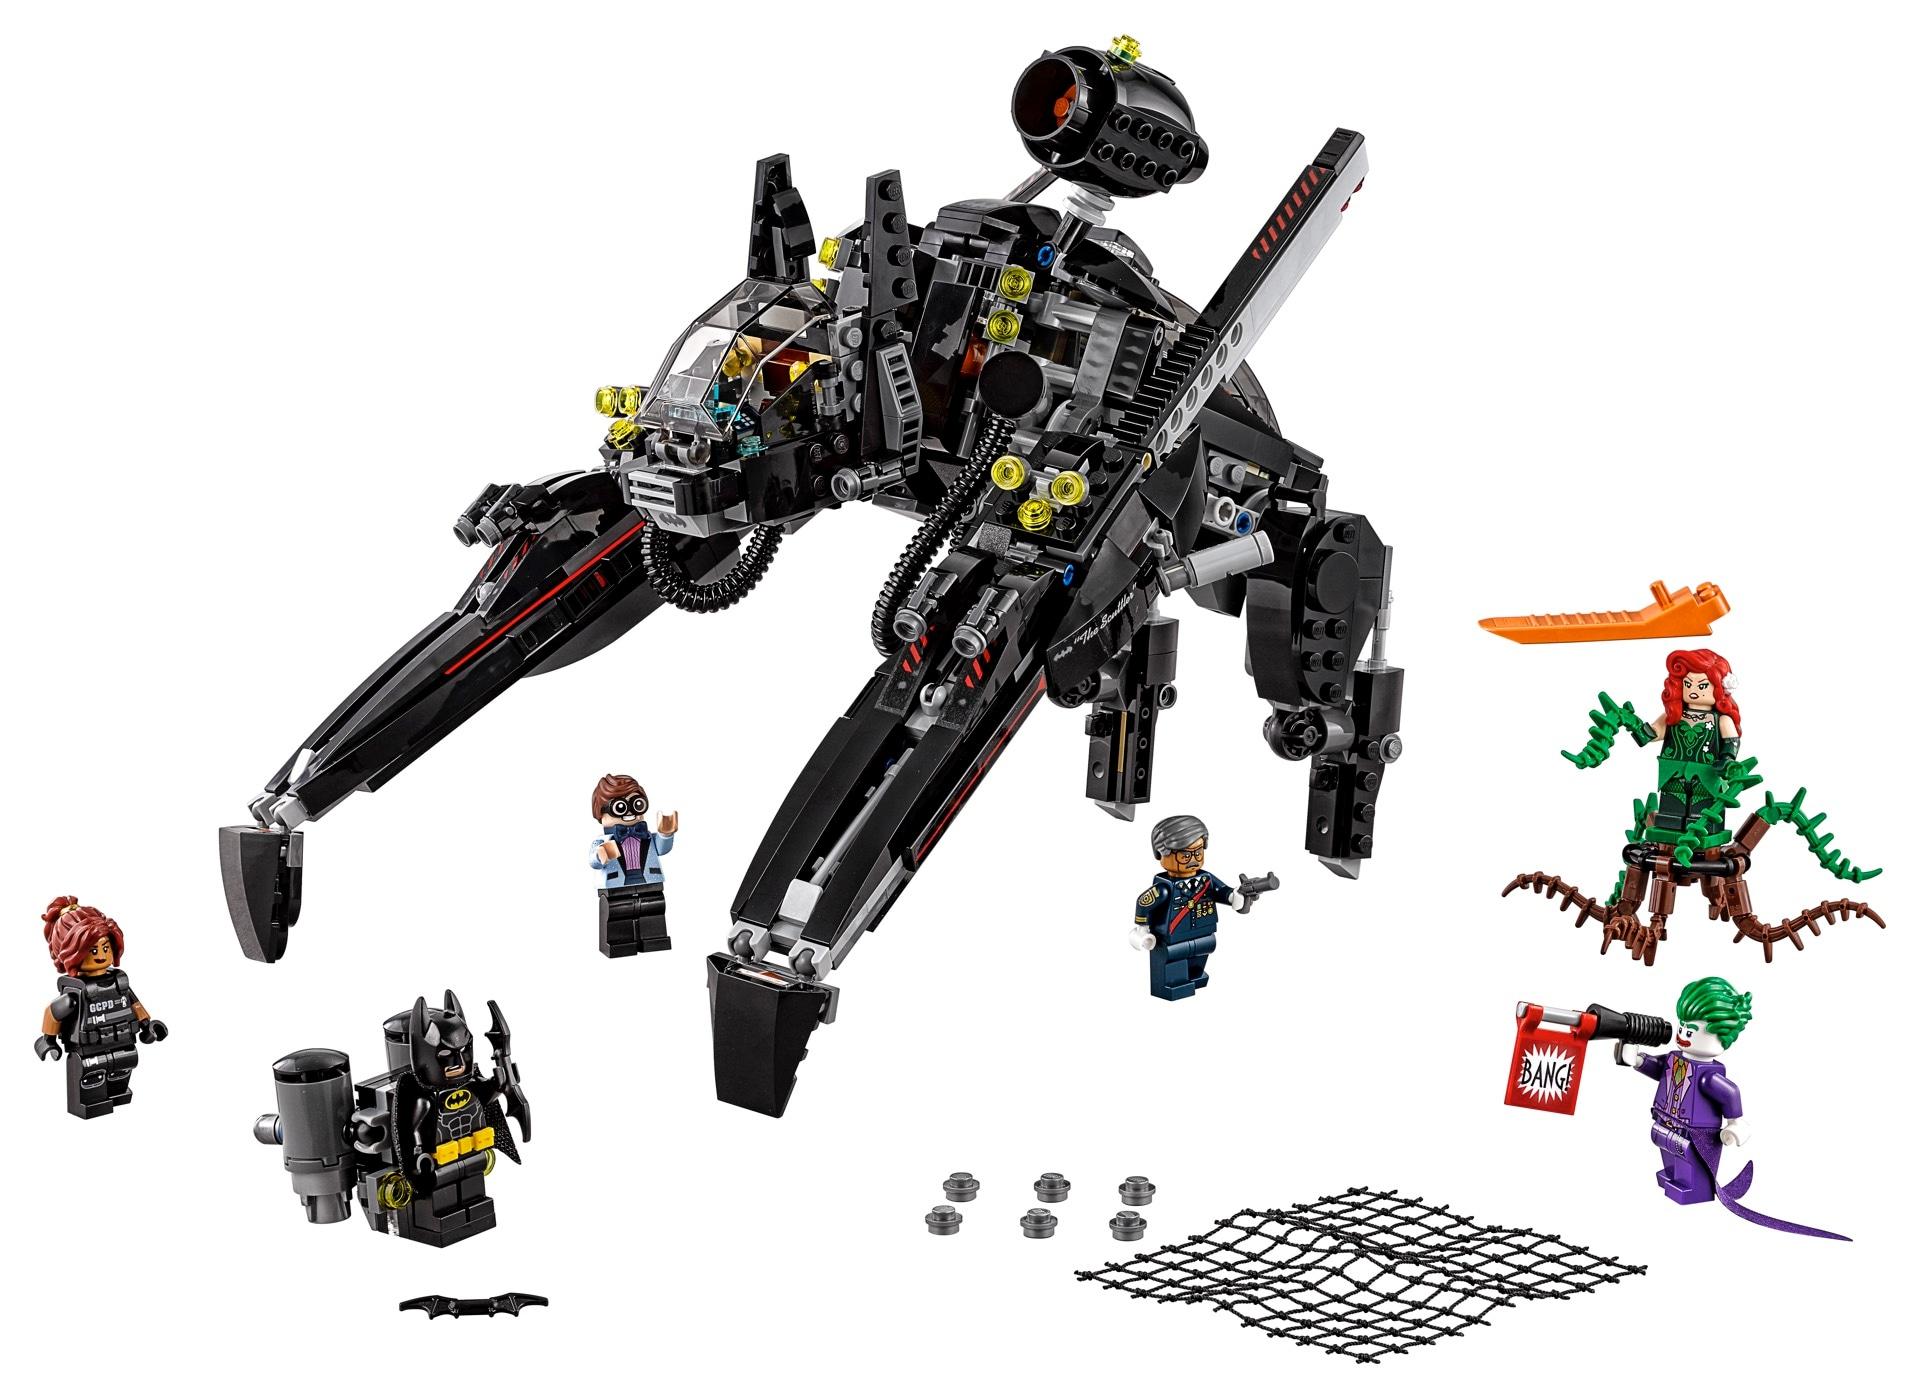 70908__the-lego-batmanmovie_prod